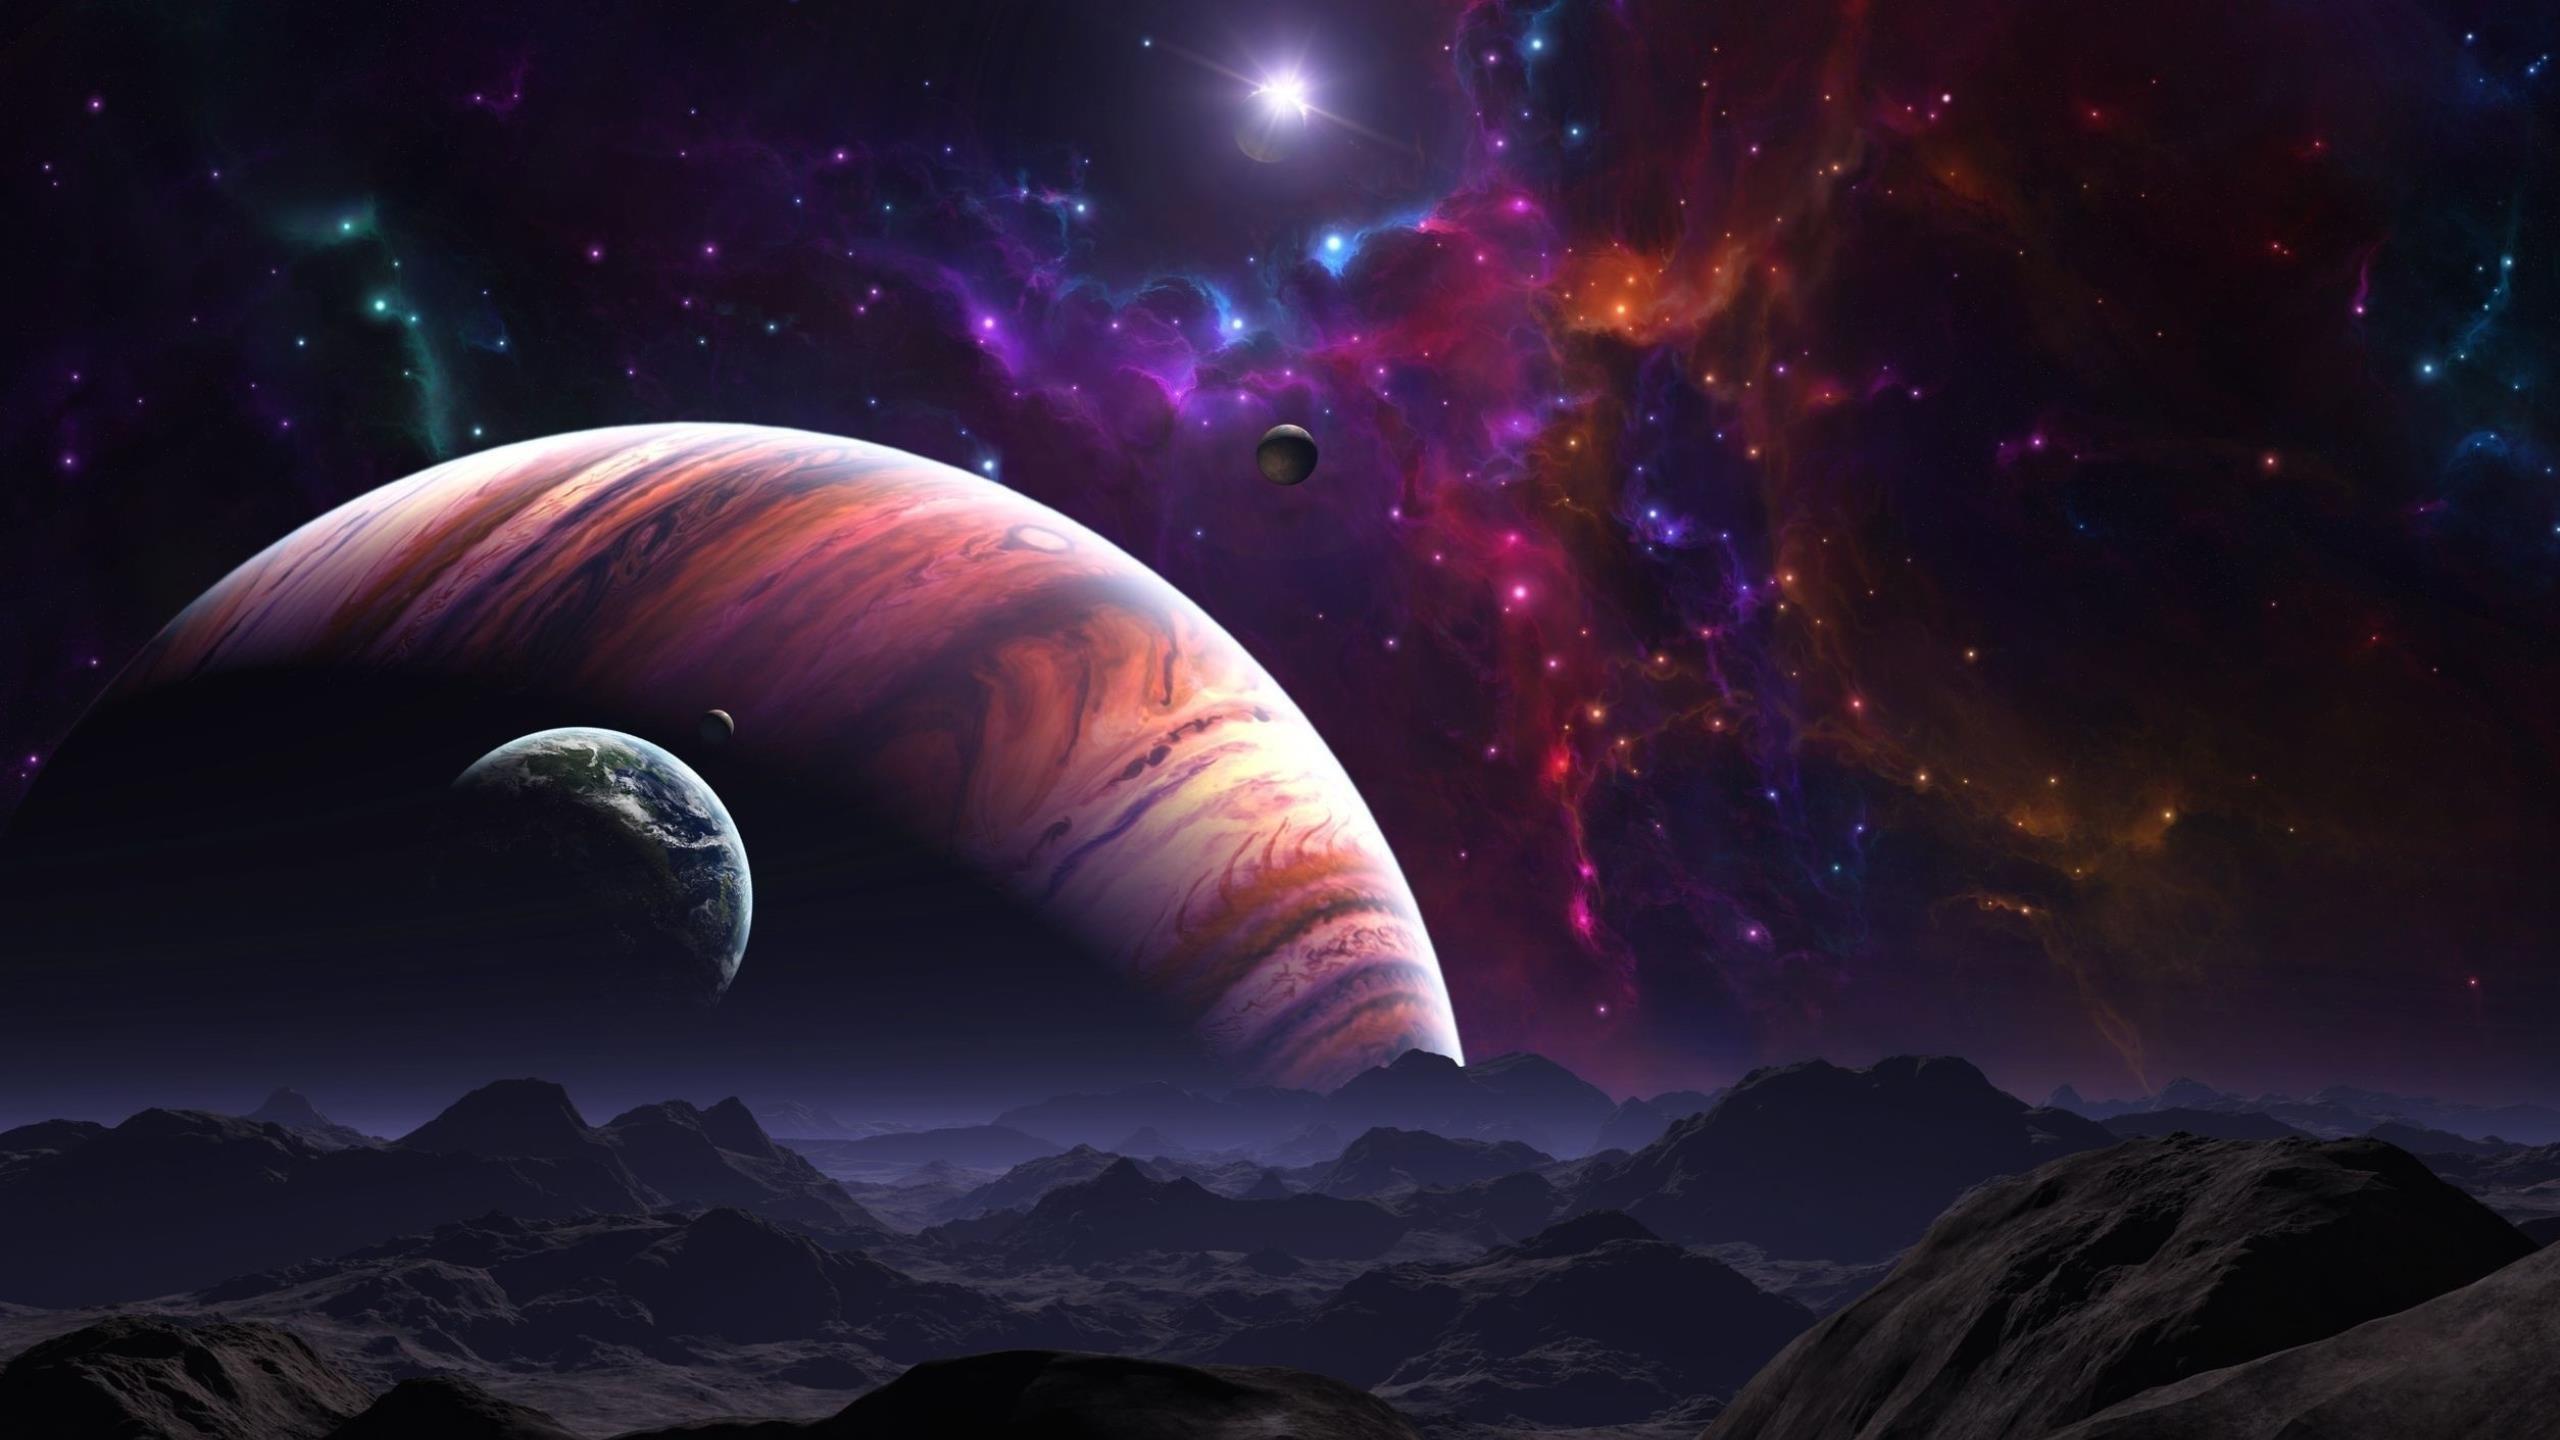 Space planet galaxy planets star stars univers wallpaper 2560x1440 2560x1440